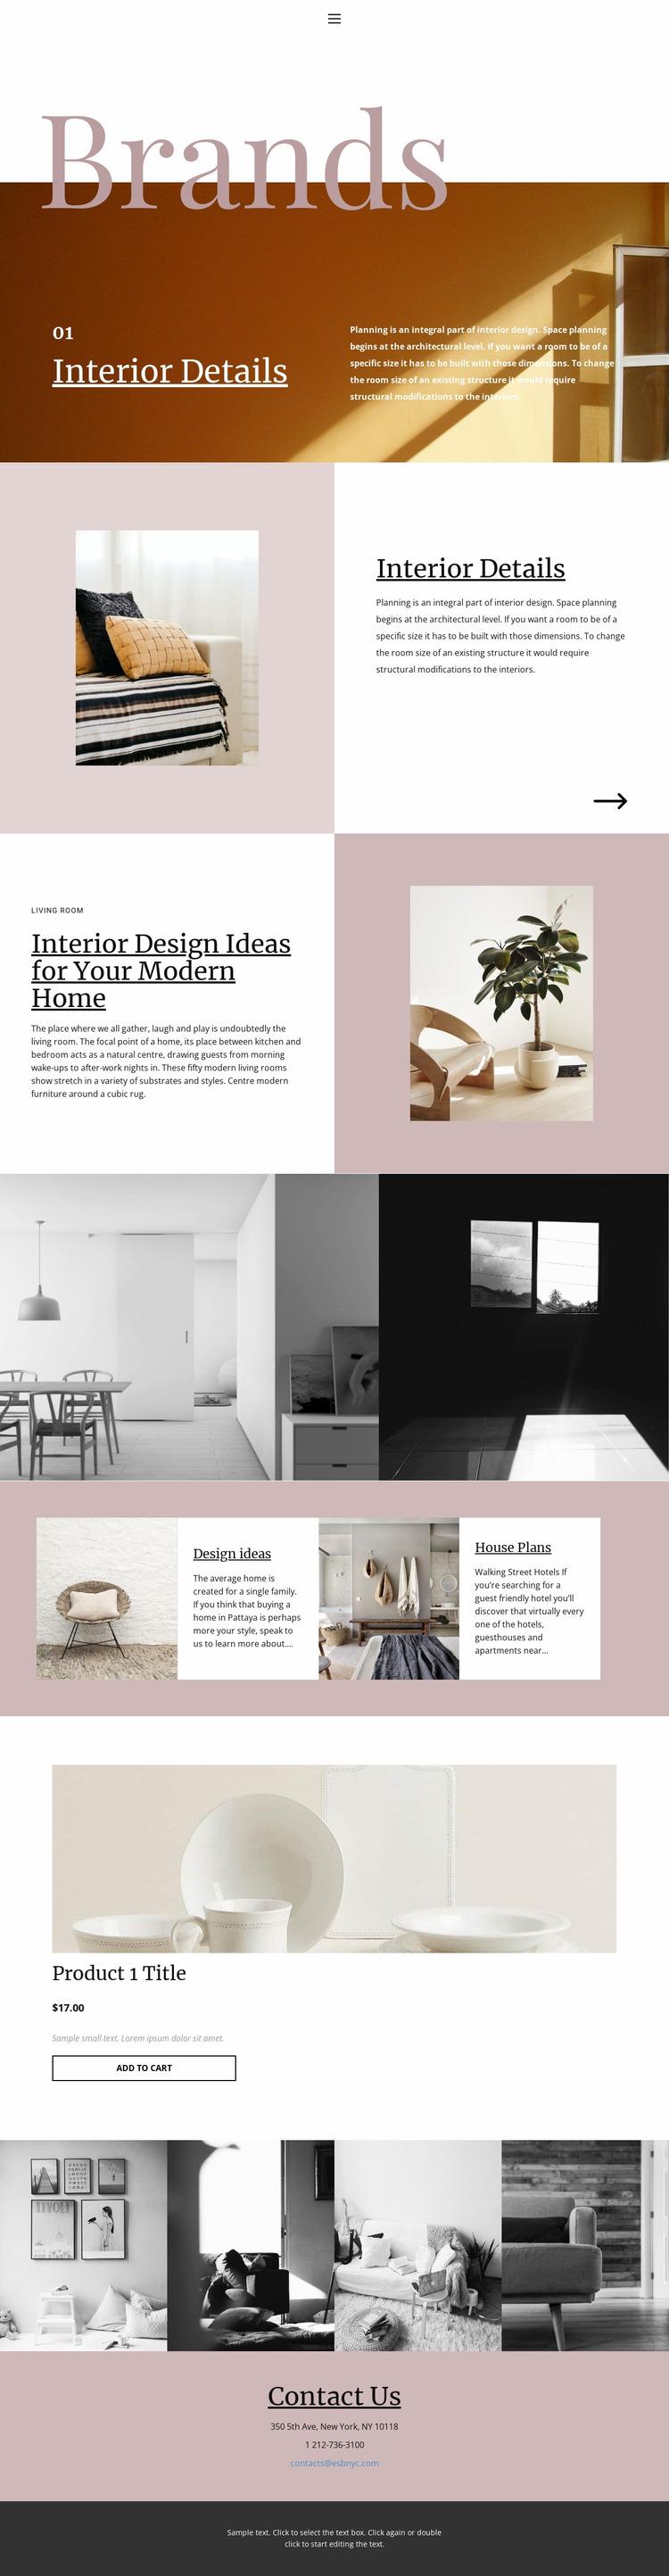 I am an interior designer Website Mockup